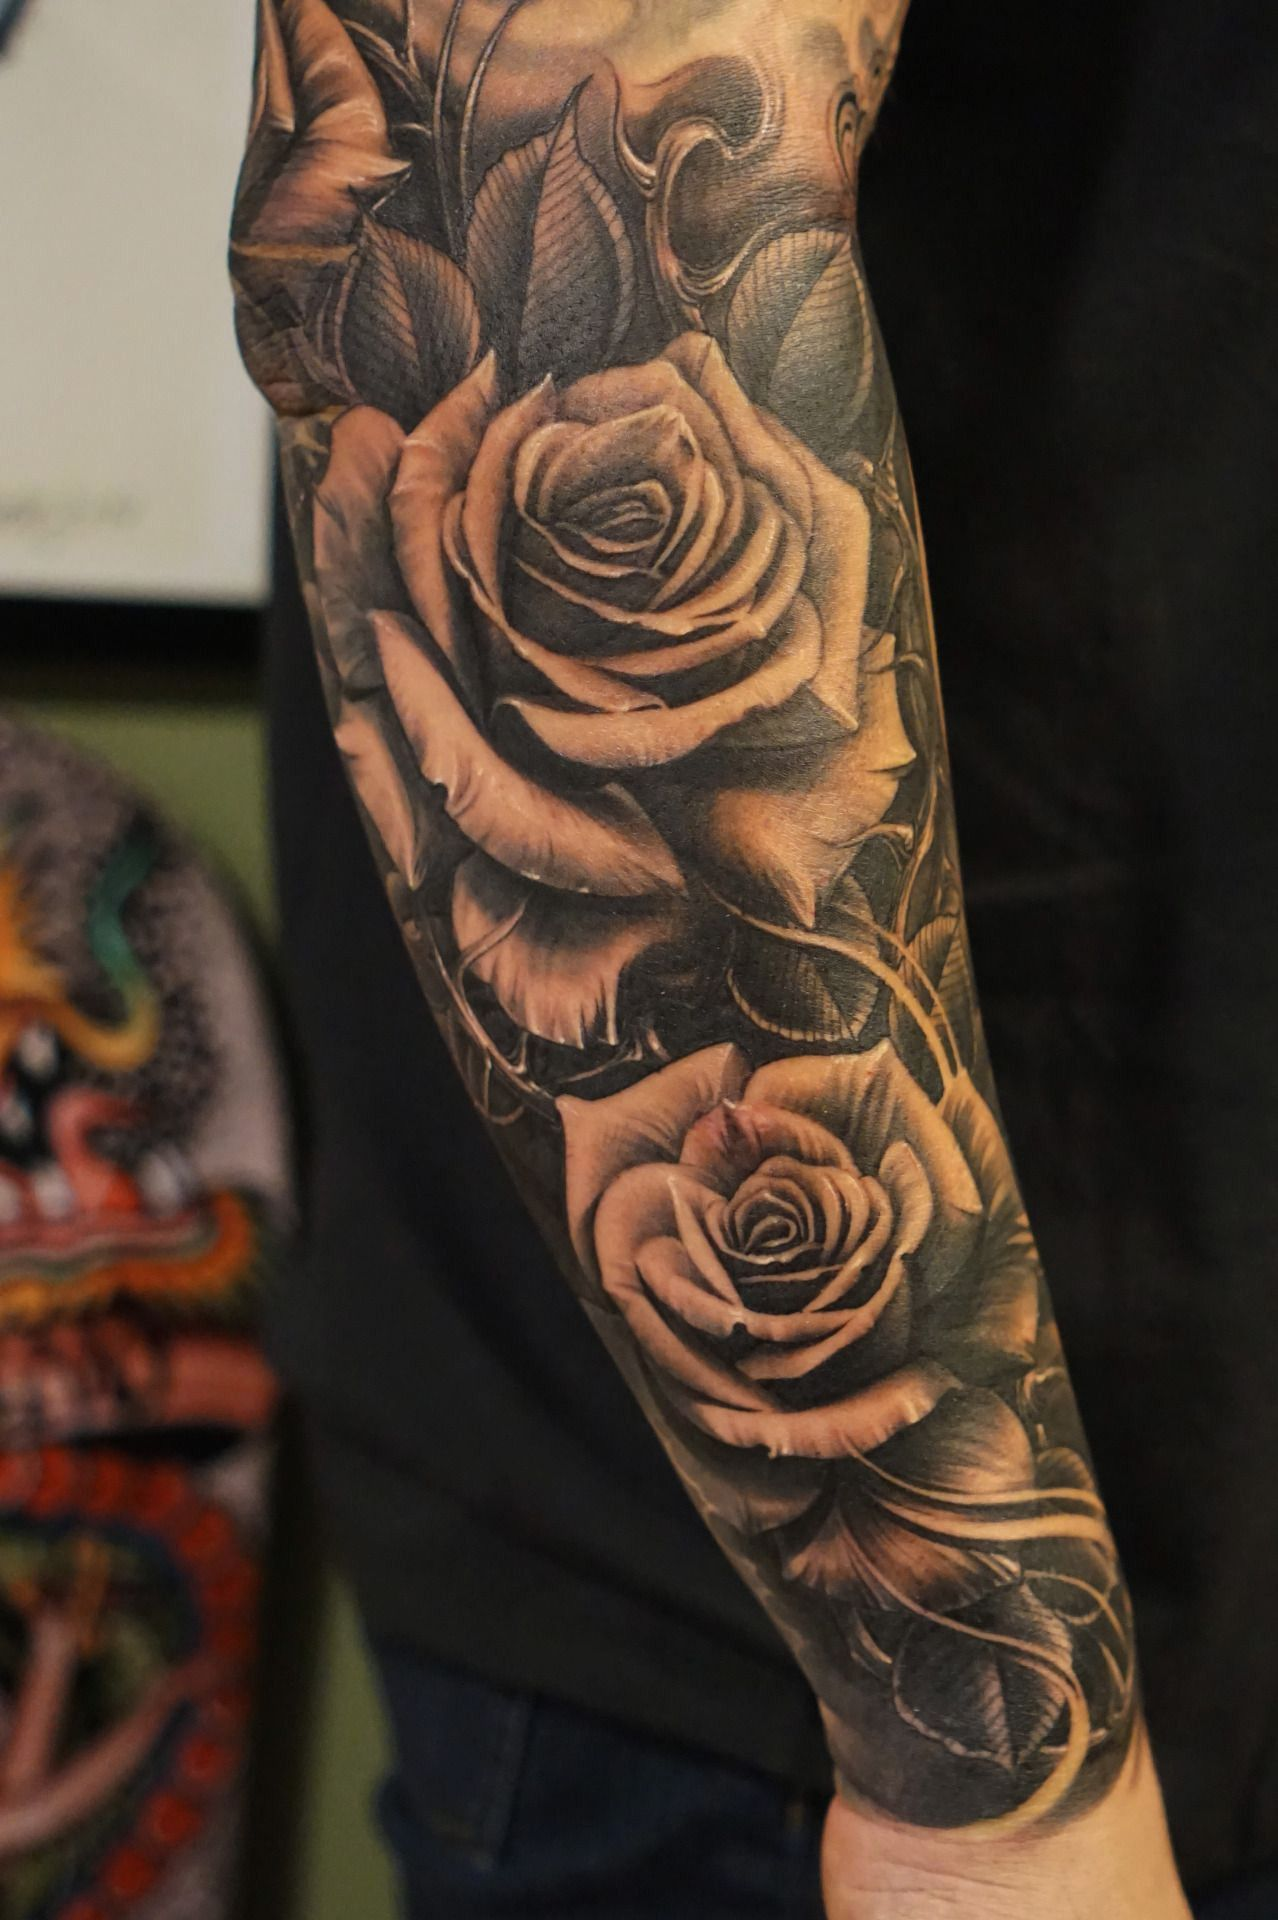 22 Cross Half Sleeve Tattoo Designs Rose Tattoo Sleeve Rose Tattoos For Men Cool Forearm Tattoos